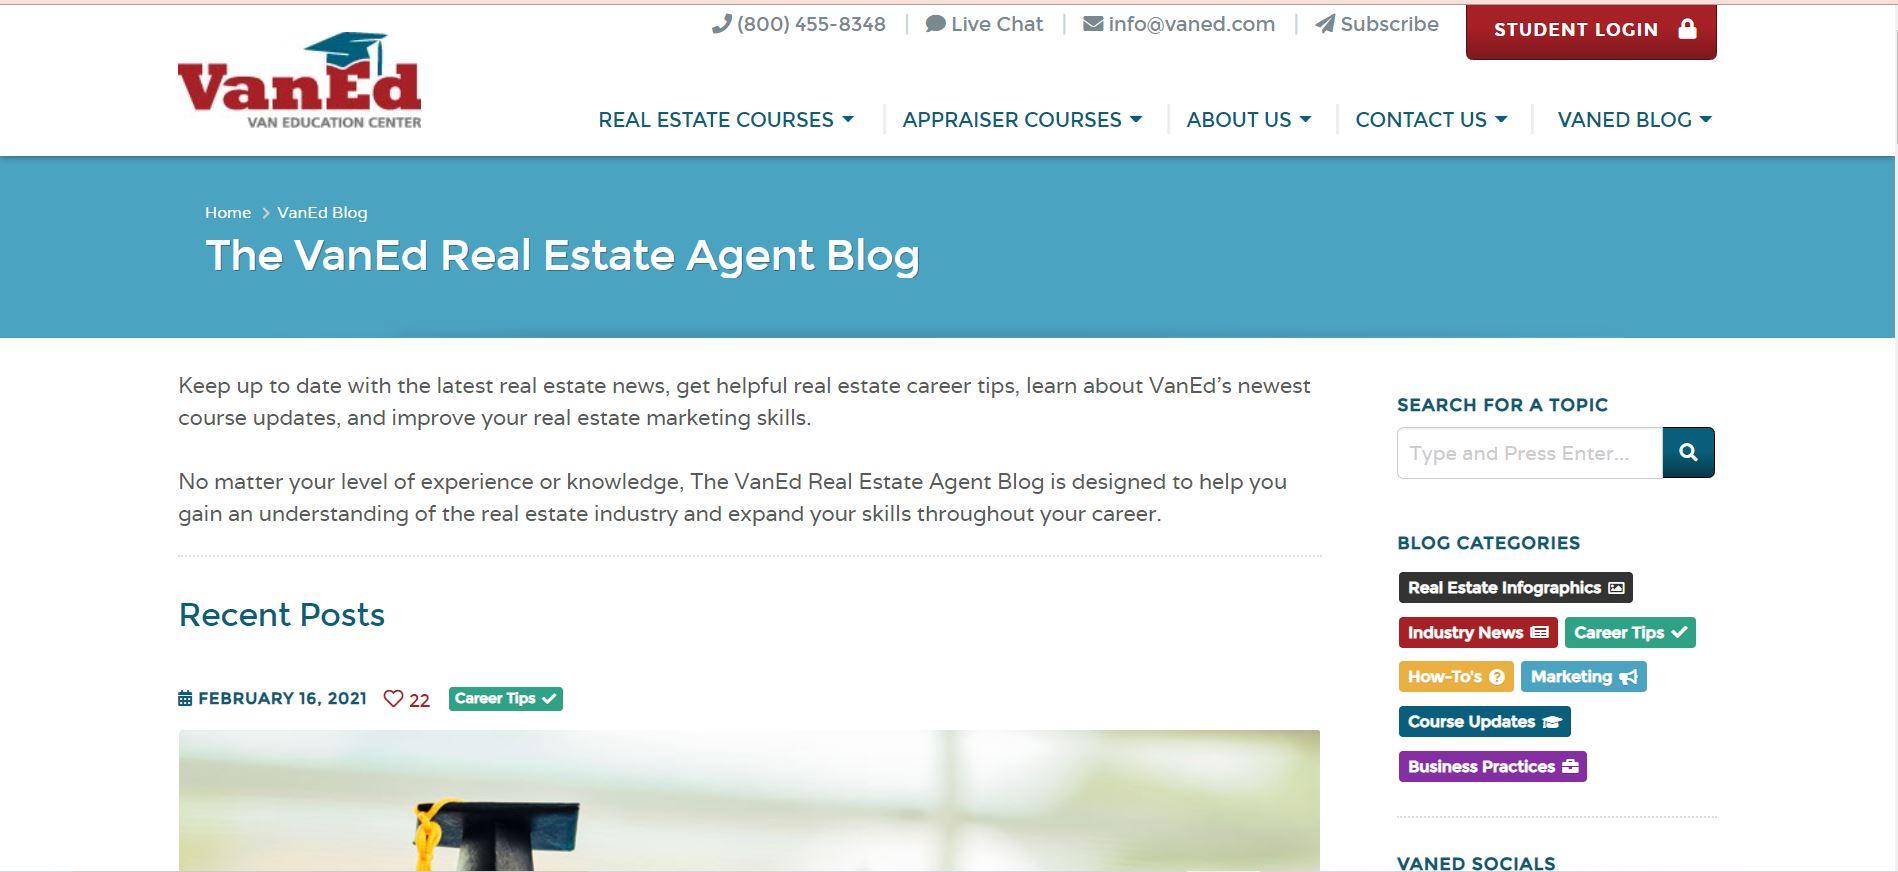 VanEd Real Estate Agent